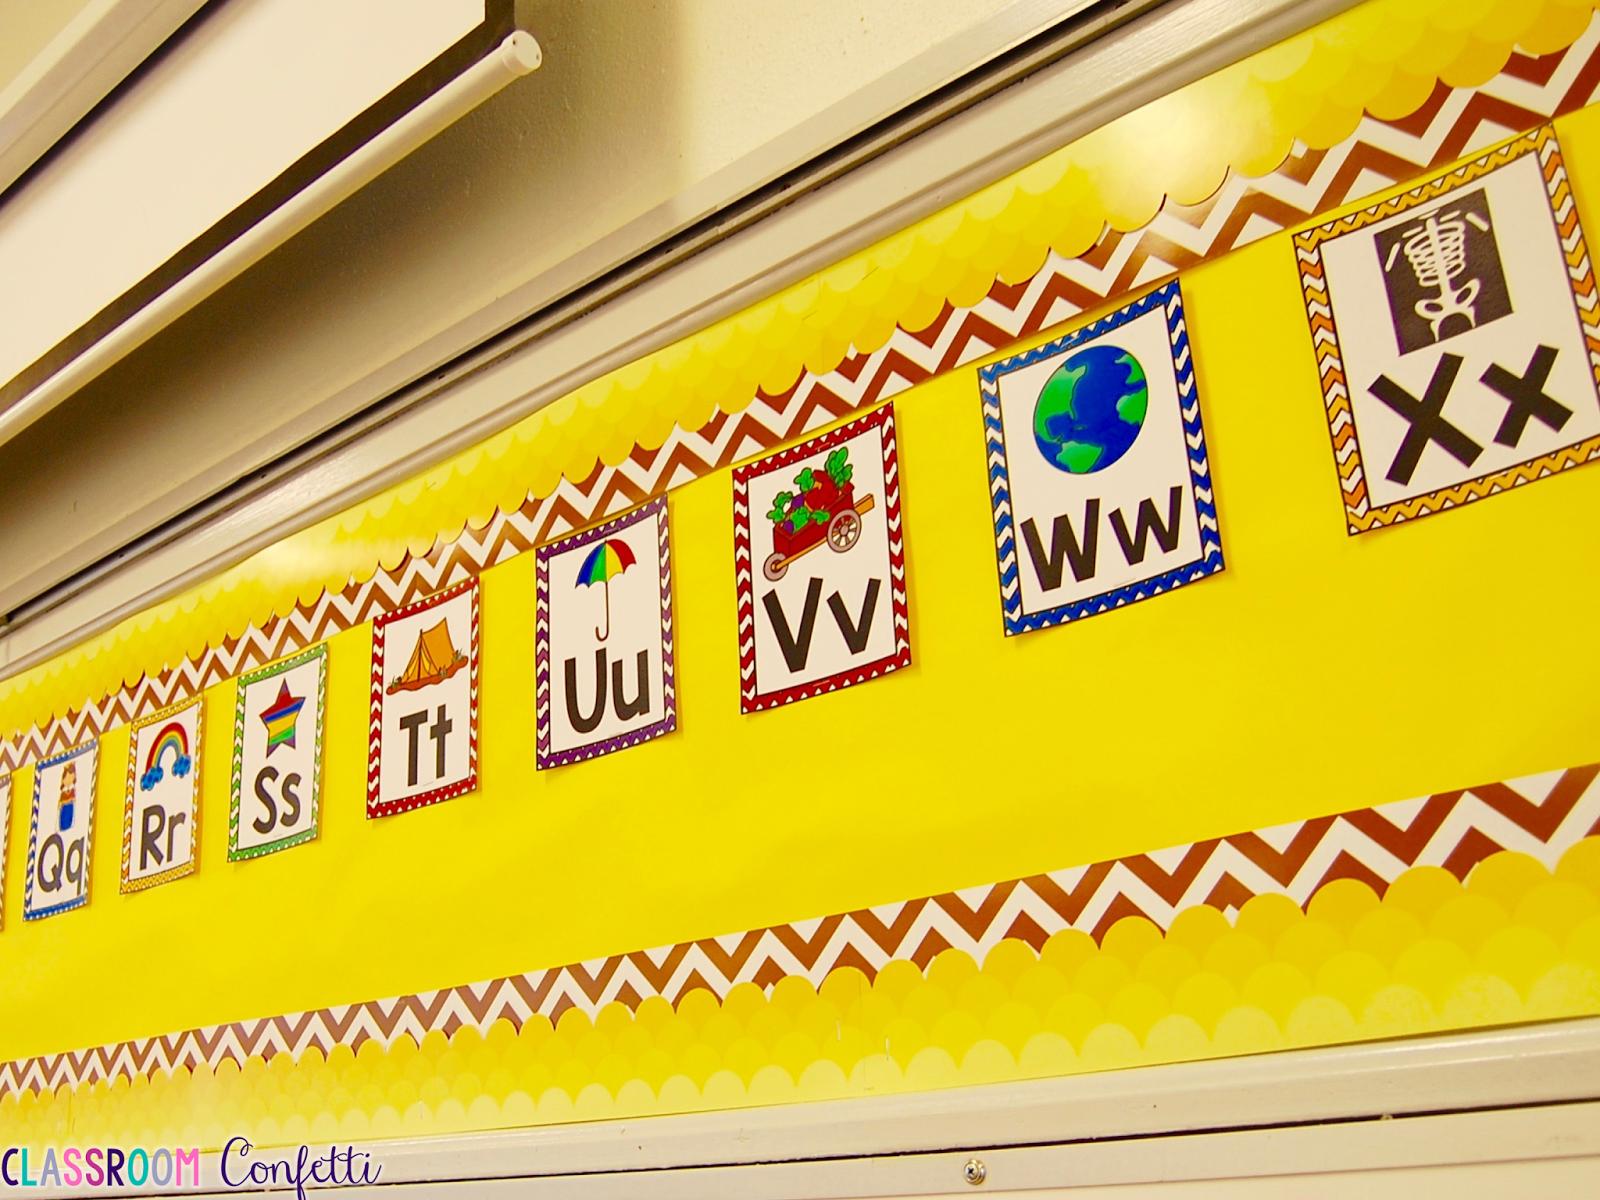 Classroom Confetti: The (Before) Back to School List